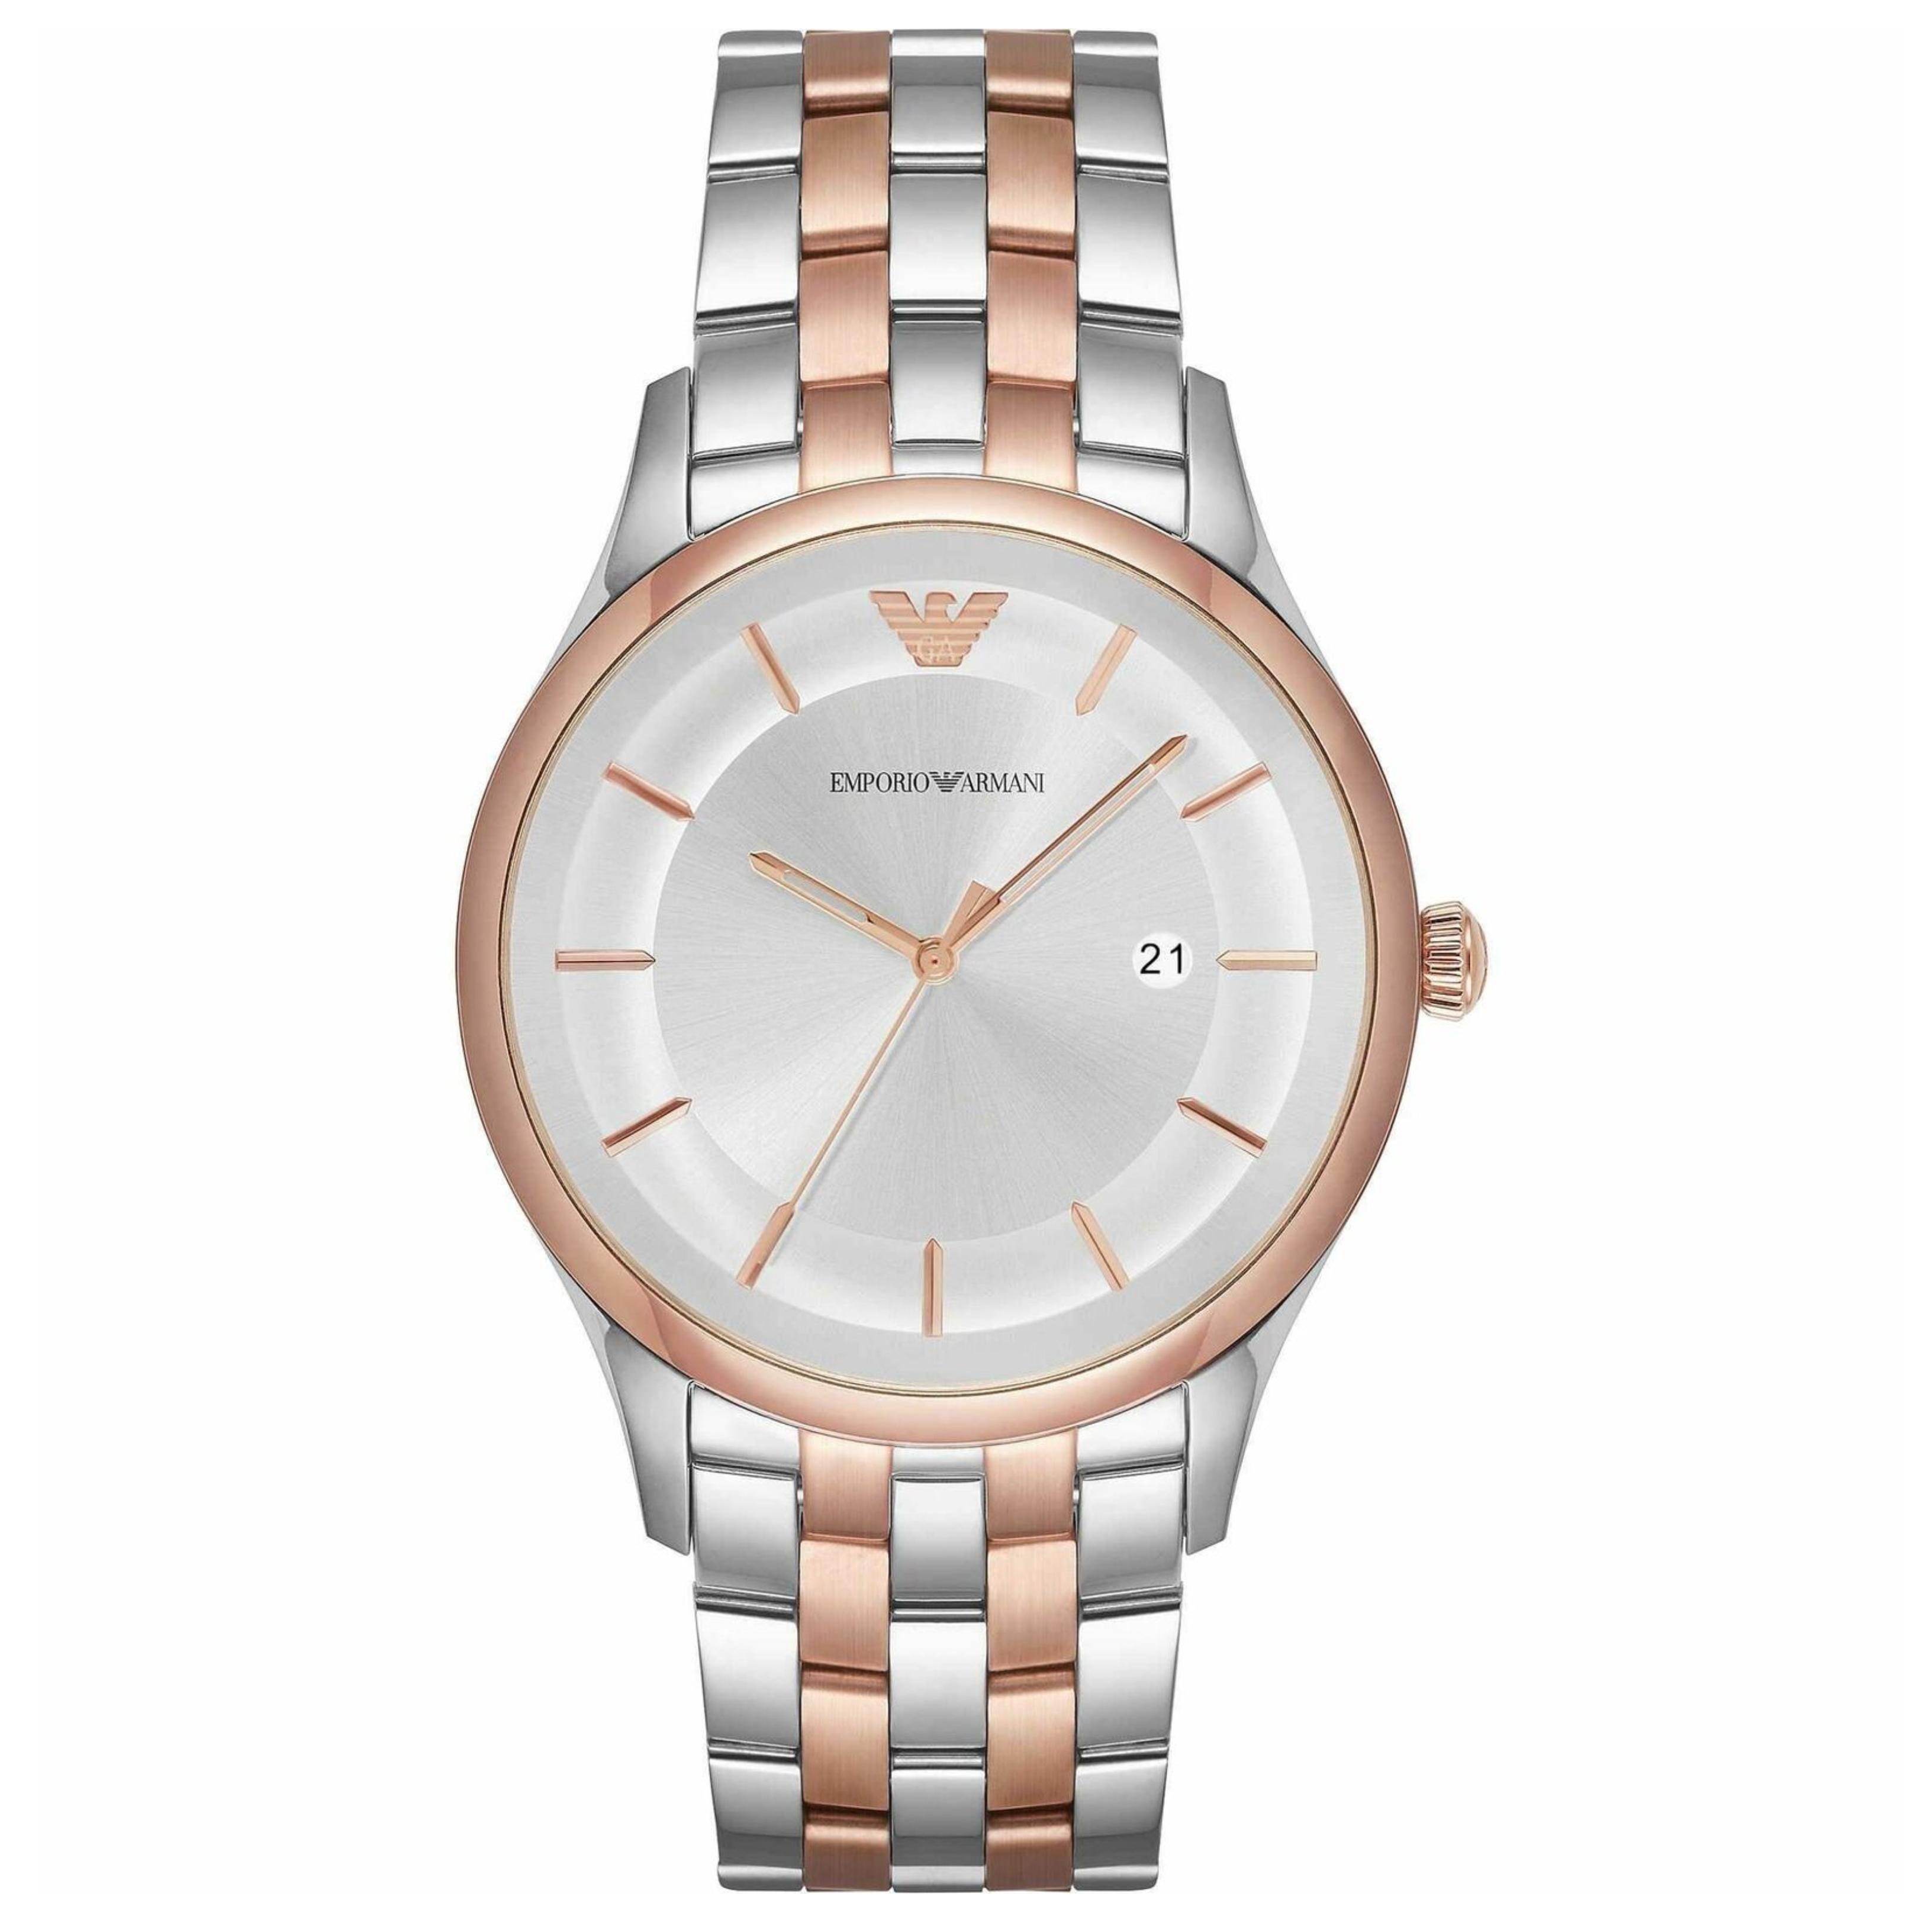 Emporio Armani Lambda Men's Watch AR11044 | Silver Dial | Dual Tone Stainless Strap